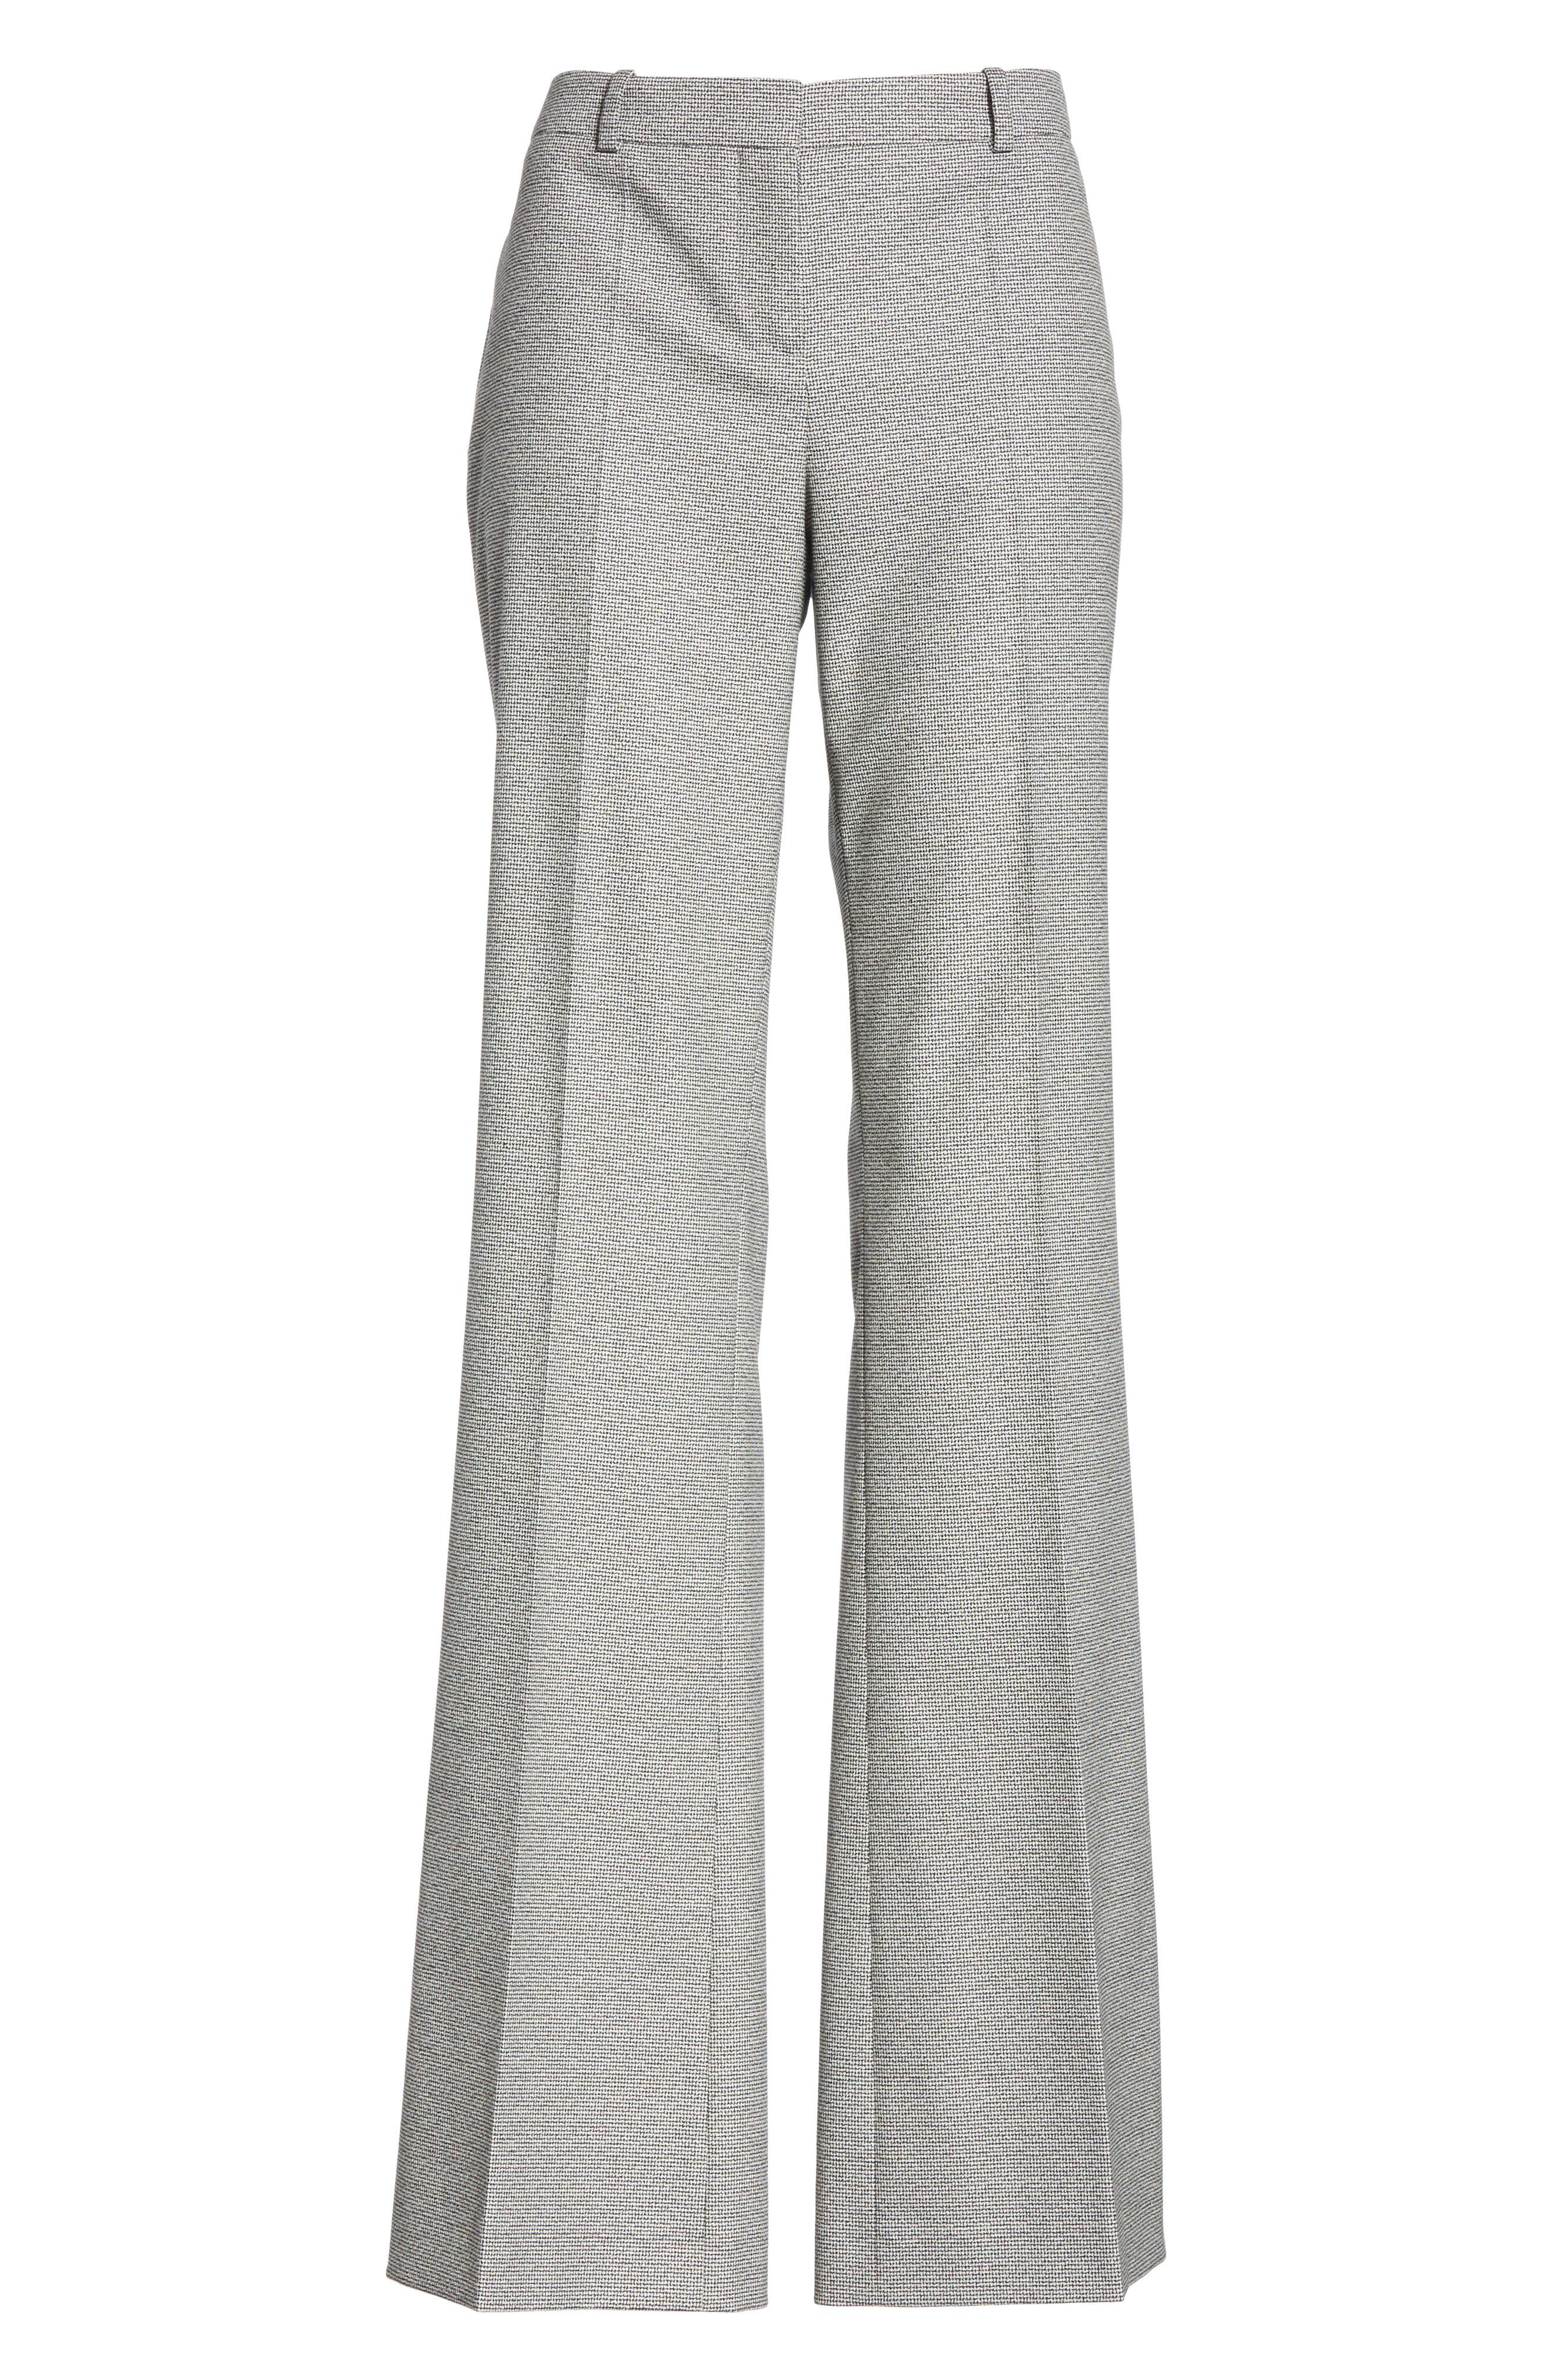 Tulea Blurred Optic Wool Suiting Trousers,                             Alternate thumbnail 6, color,                             BLACK FANTASY